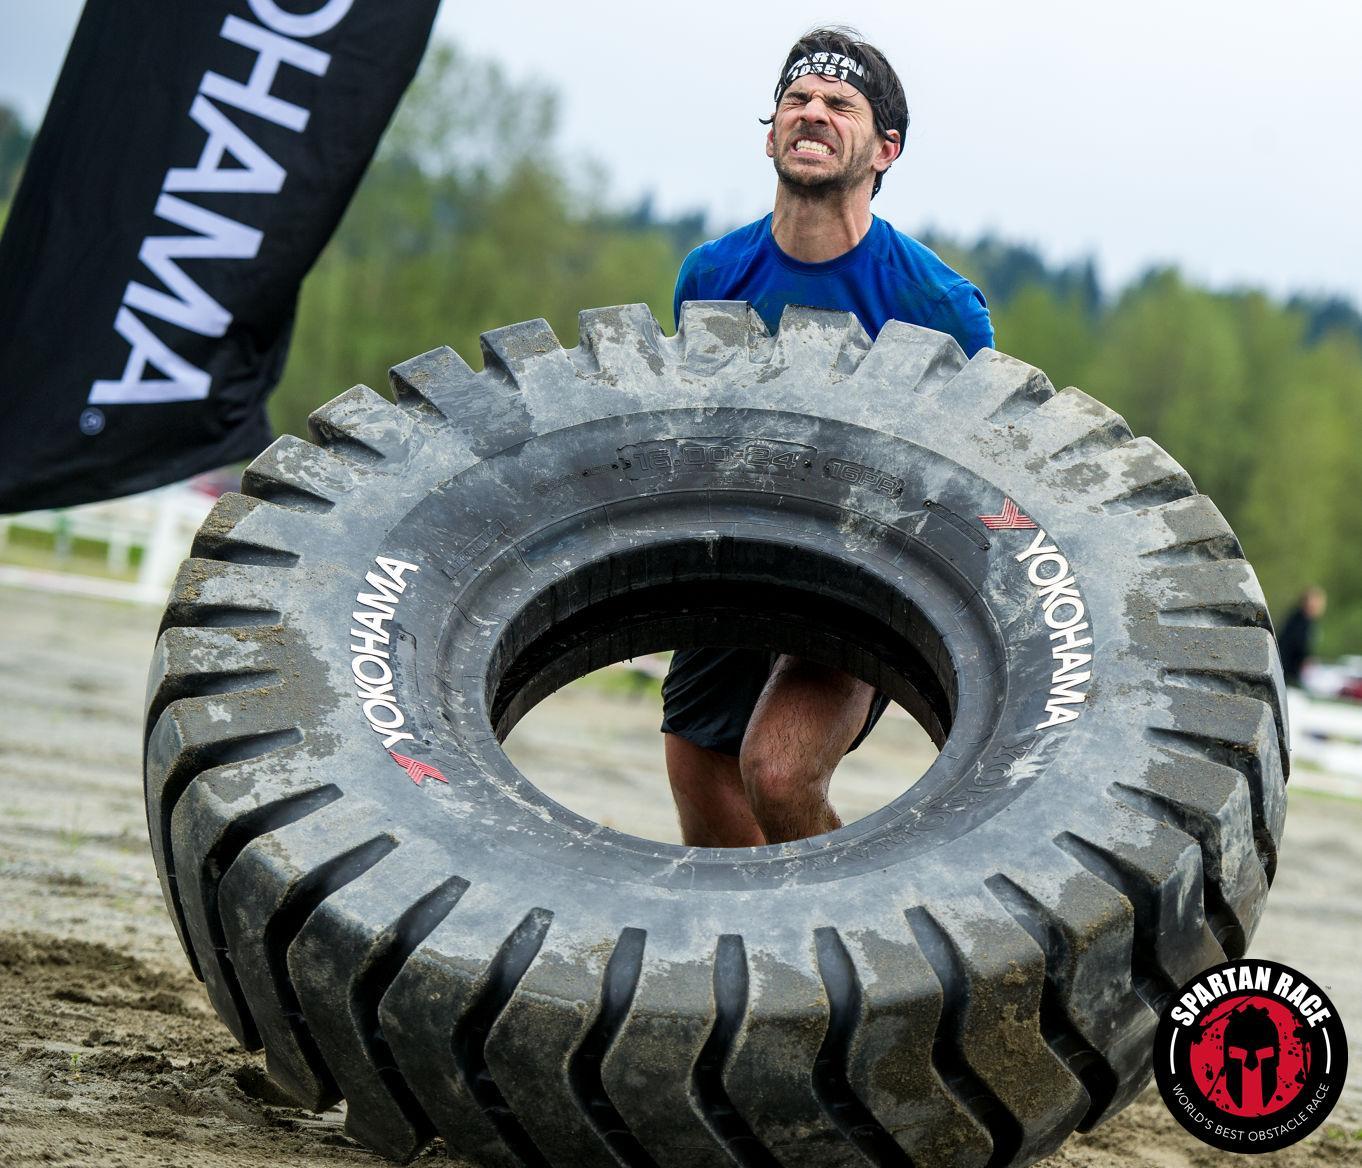 Spartan-Seattle-Super-Emerald-City-Open-2017-Tire-Flip